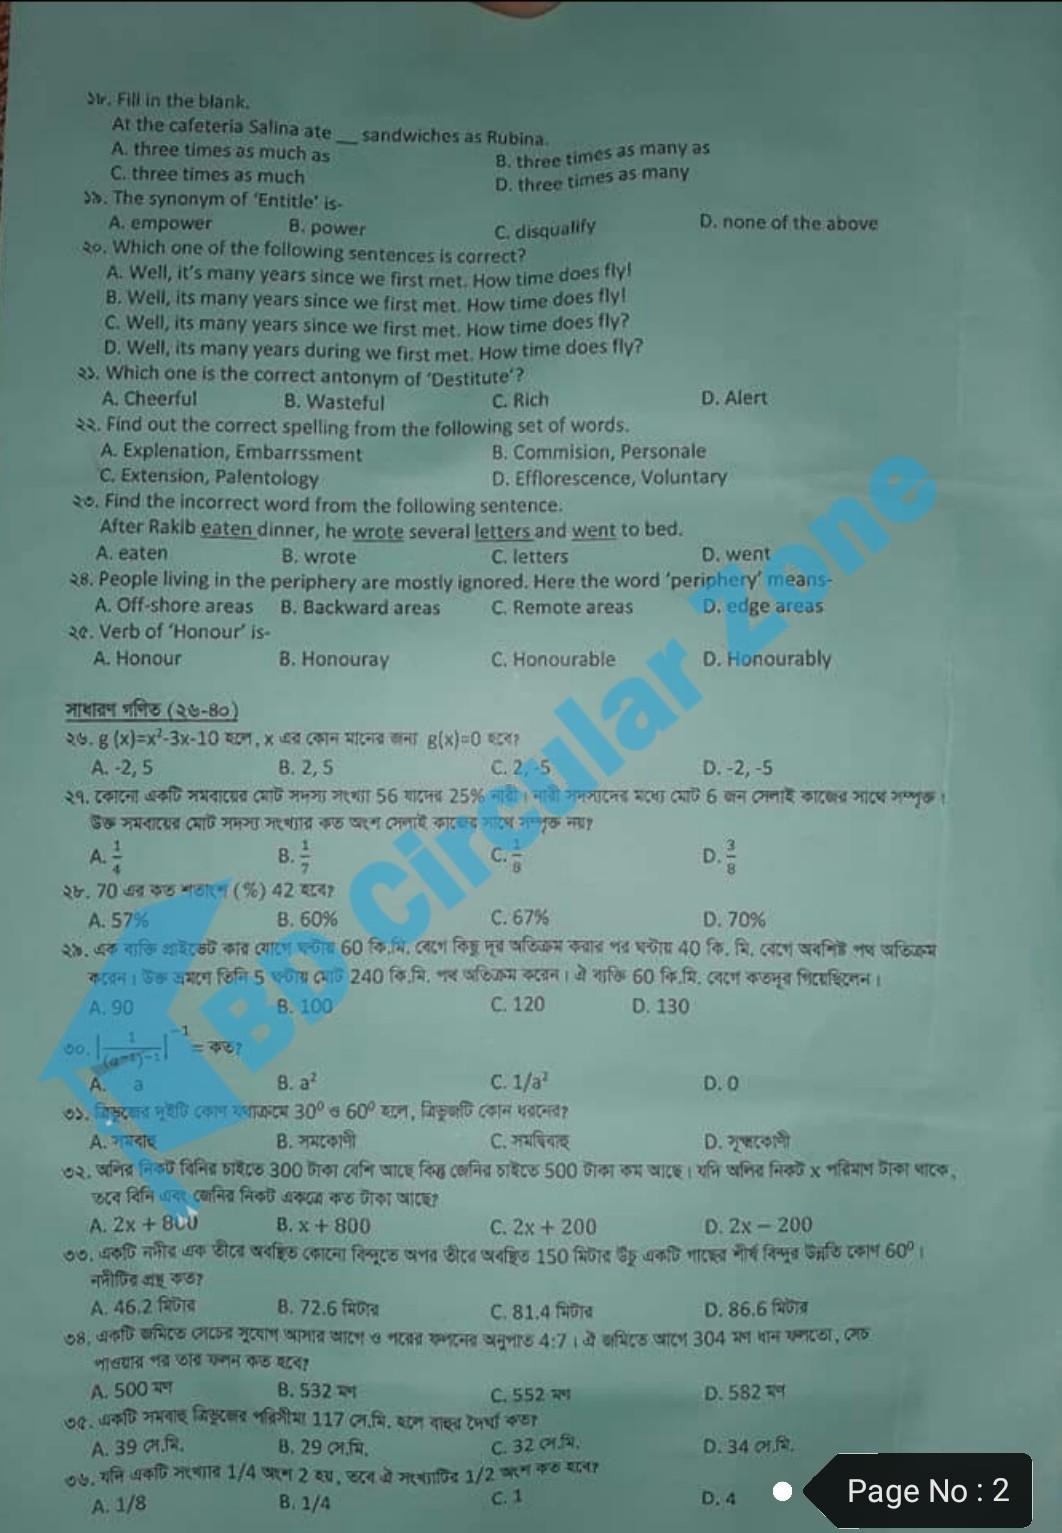 JU B Unit admission test Question 2018-19